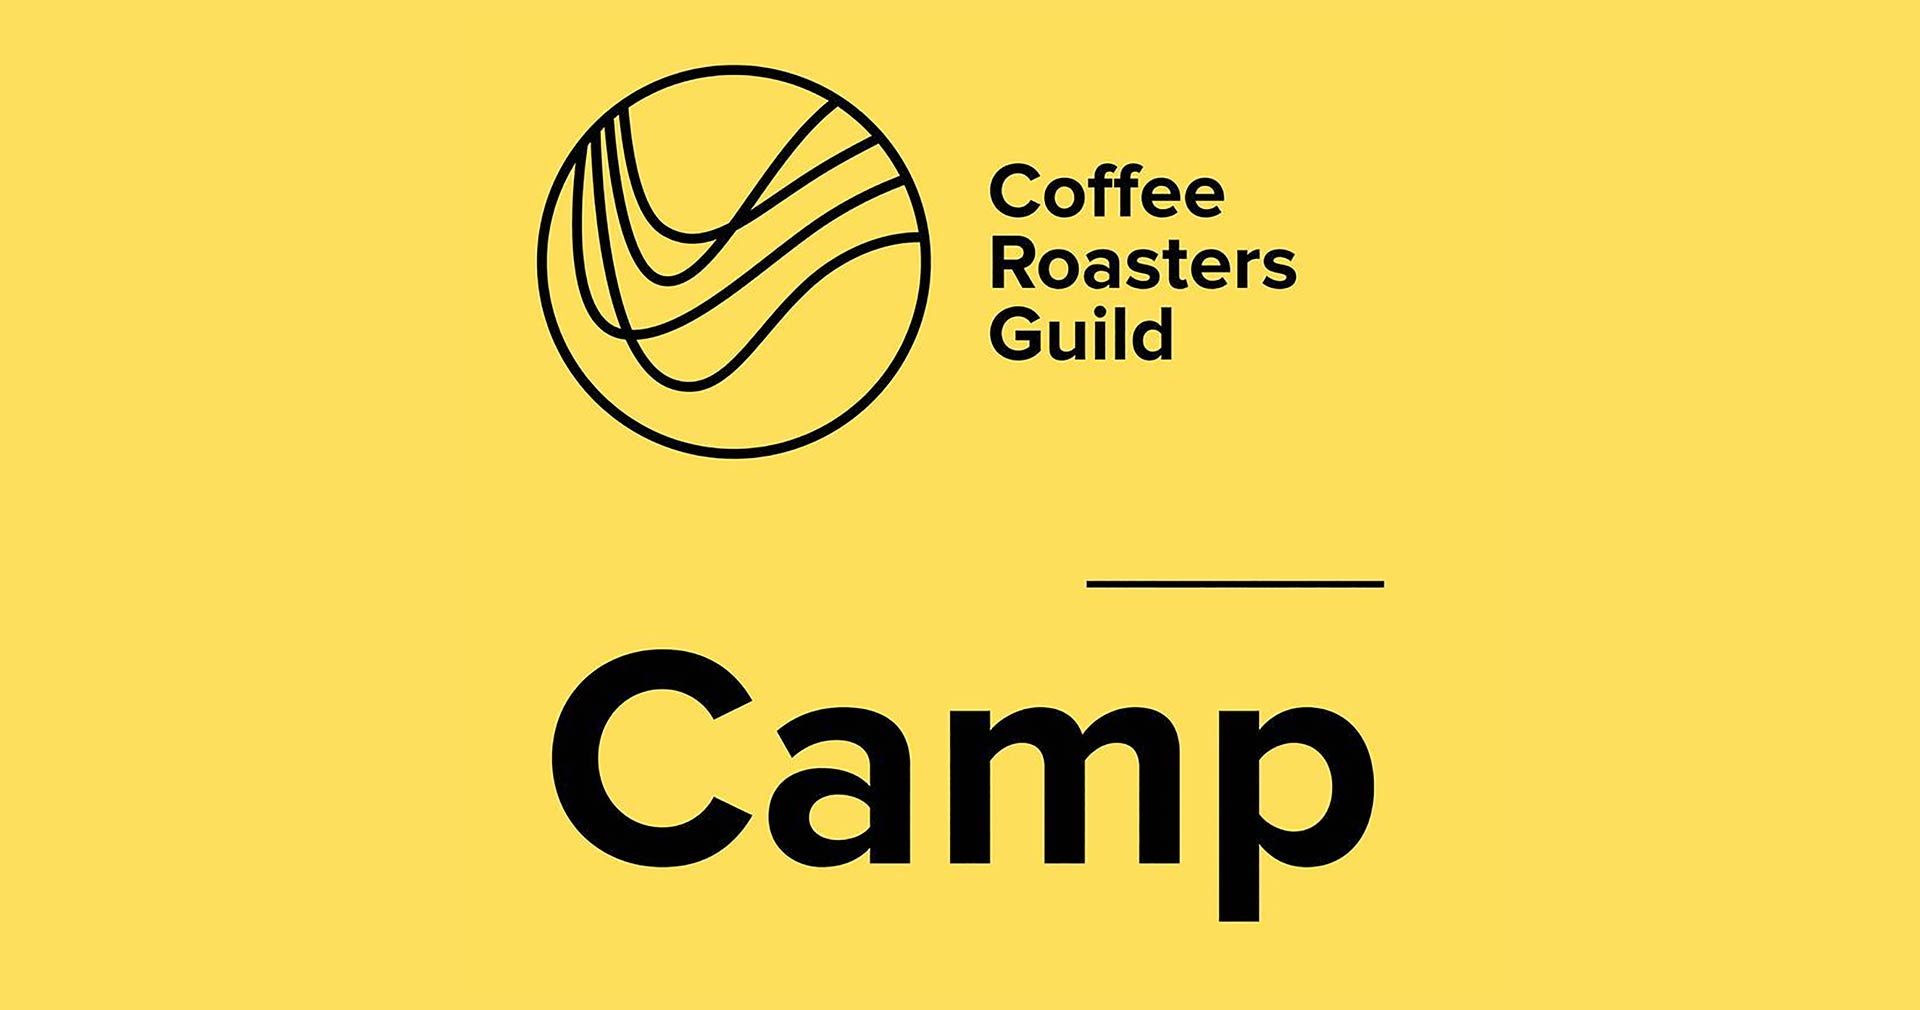 Kaffee-Events, Festival und Kalender: Coffee Roasters Guild Camp 2019. CafCaf – Kaffee & Blog, Kaffeeblog